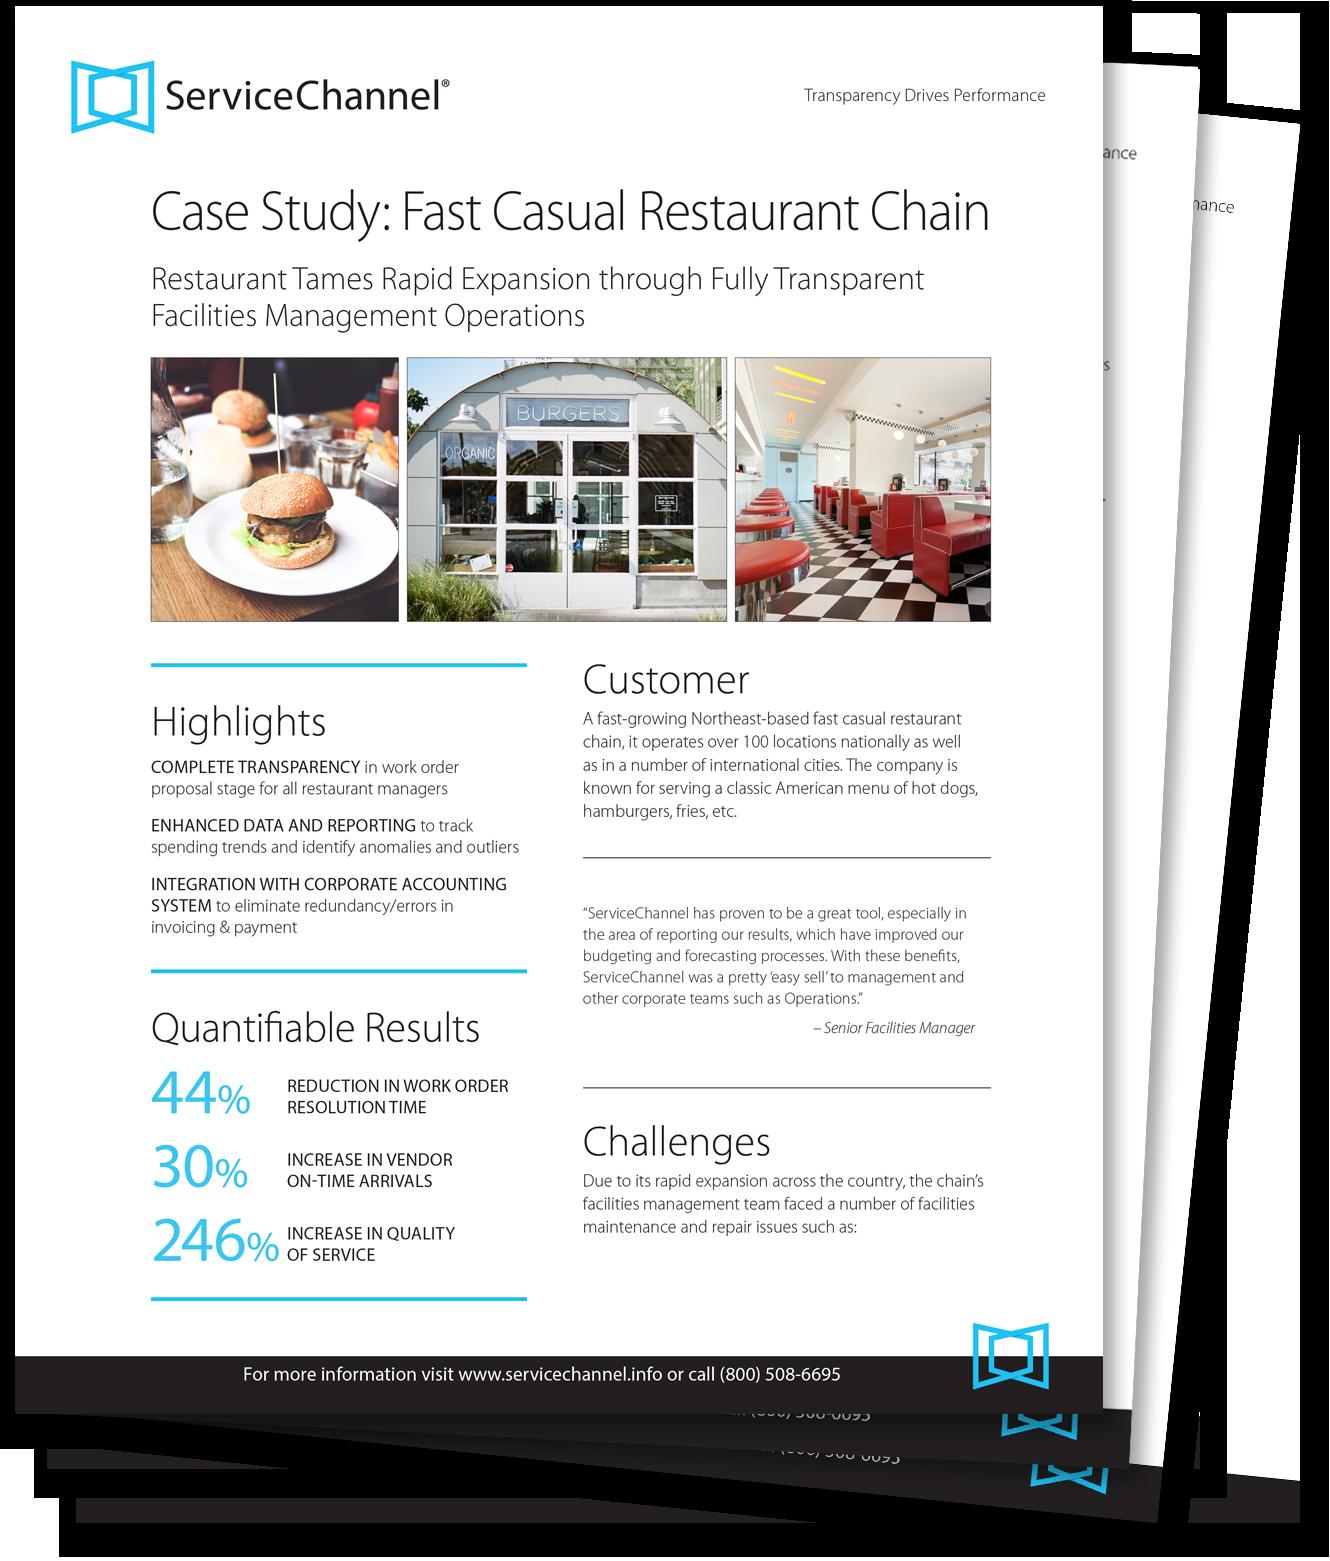 Fast_Casual_Restaurant_Facilities_Management_Case_Study_CTA.png